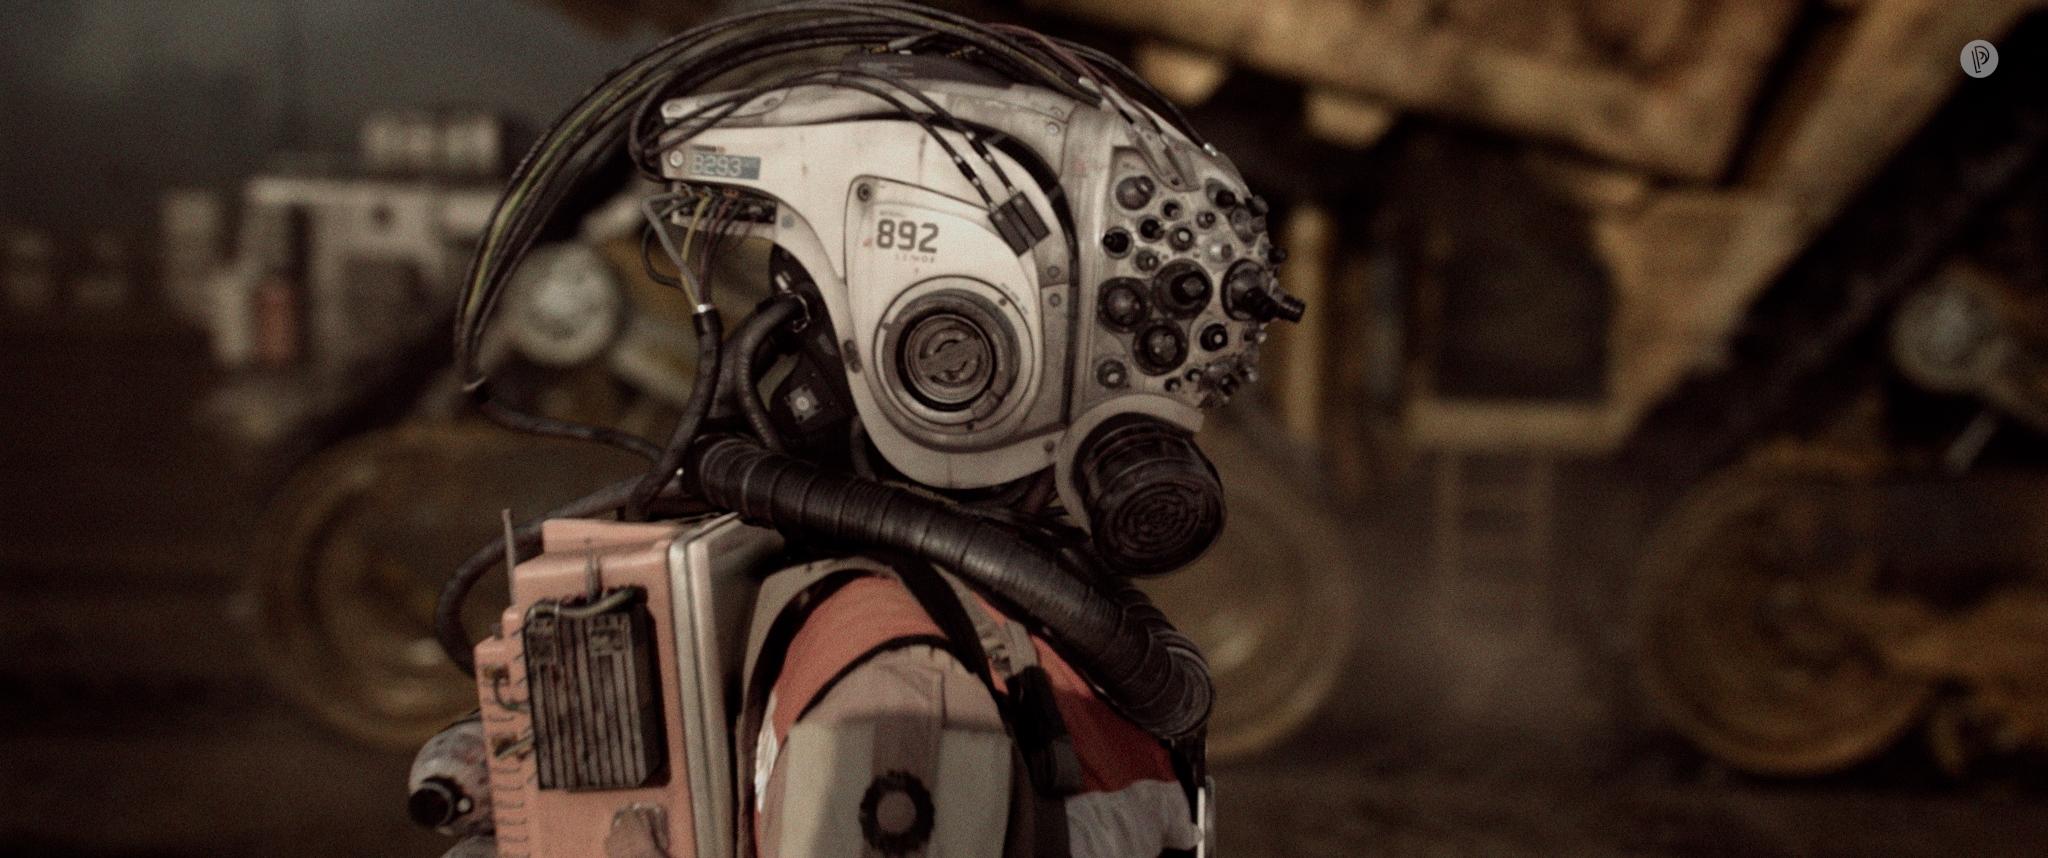 helmet: modelling, additional texturing, lighting, rendering. bigcat: texturing, rendering